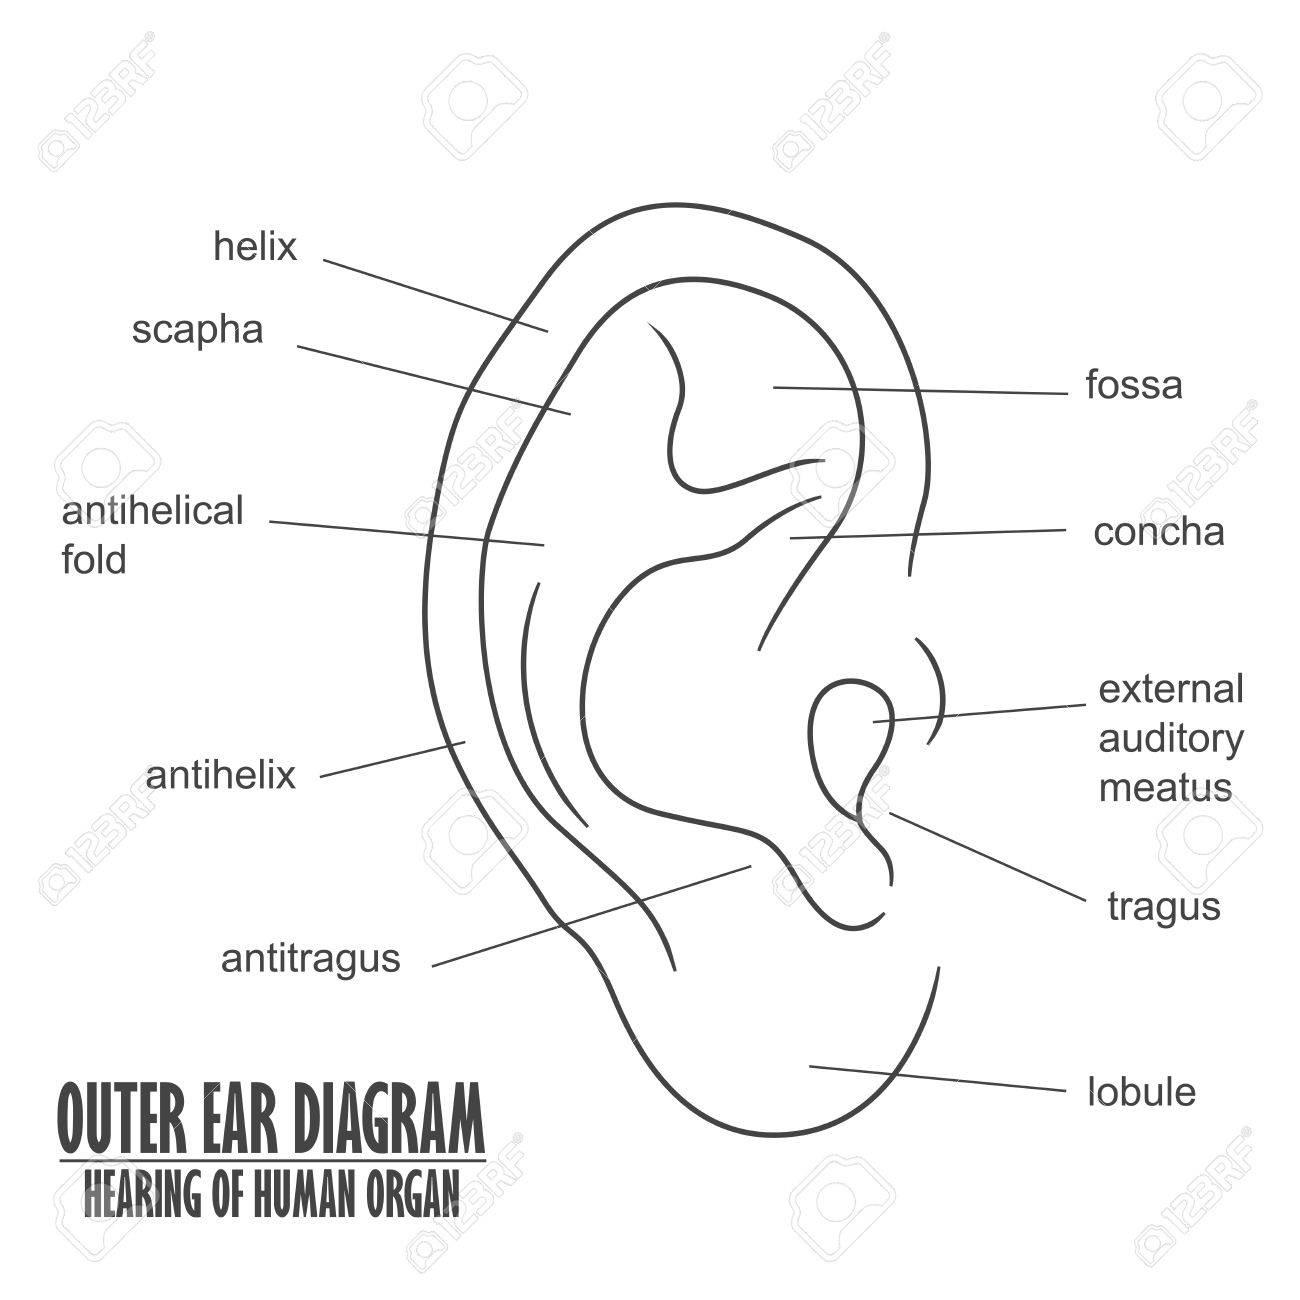 Outer Ear Diagram Hearing Of Human Organ Royalty Free Cliparts ...